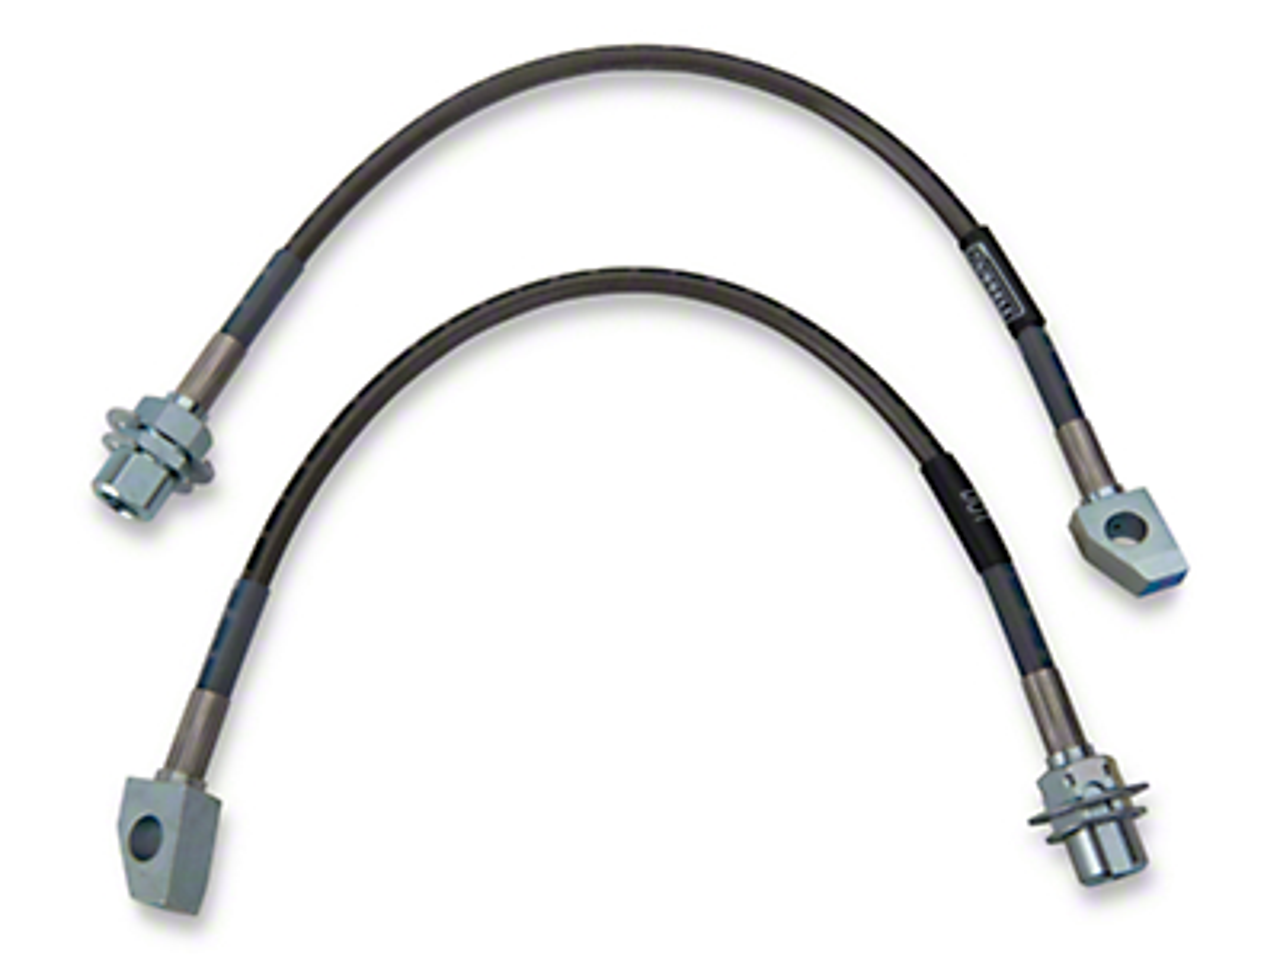 Russell Stainless Steel Braided Brake Line Kit - Front (96-01 Cobra)